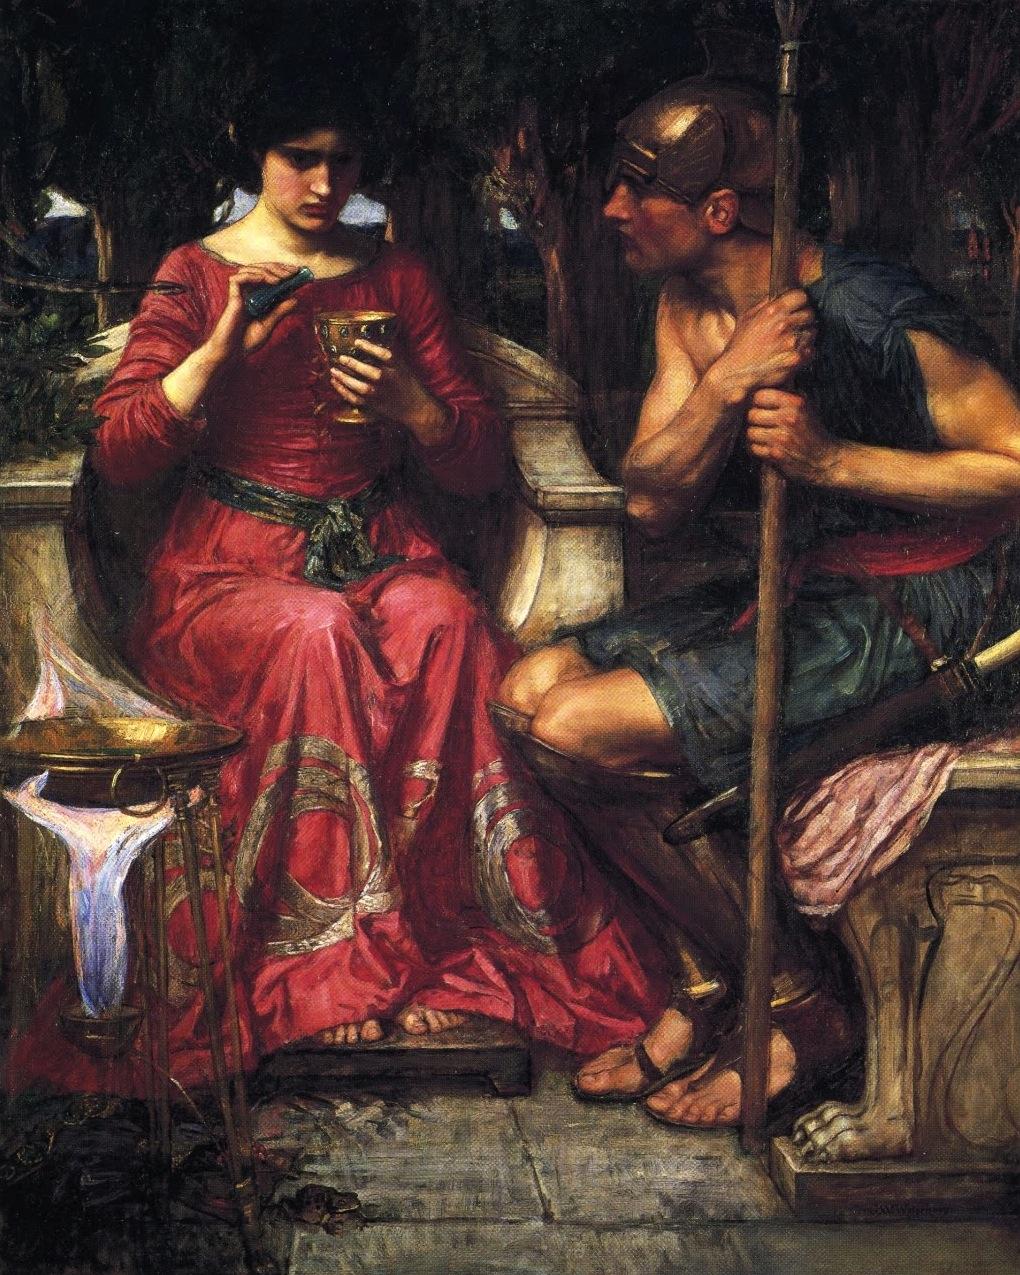 Ophelia S Adornments Blog May 2012: Victorian British Painting: John William Waterhouse, Ctd